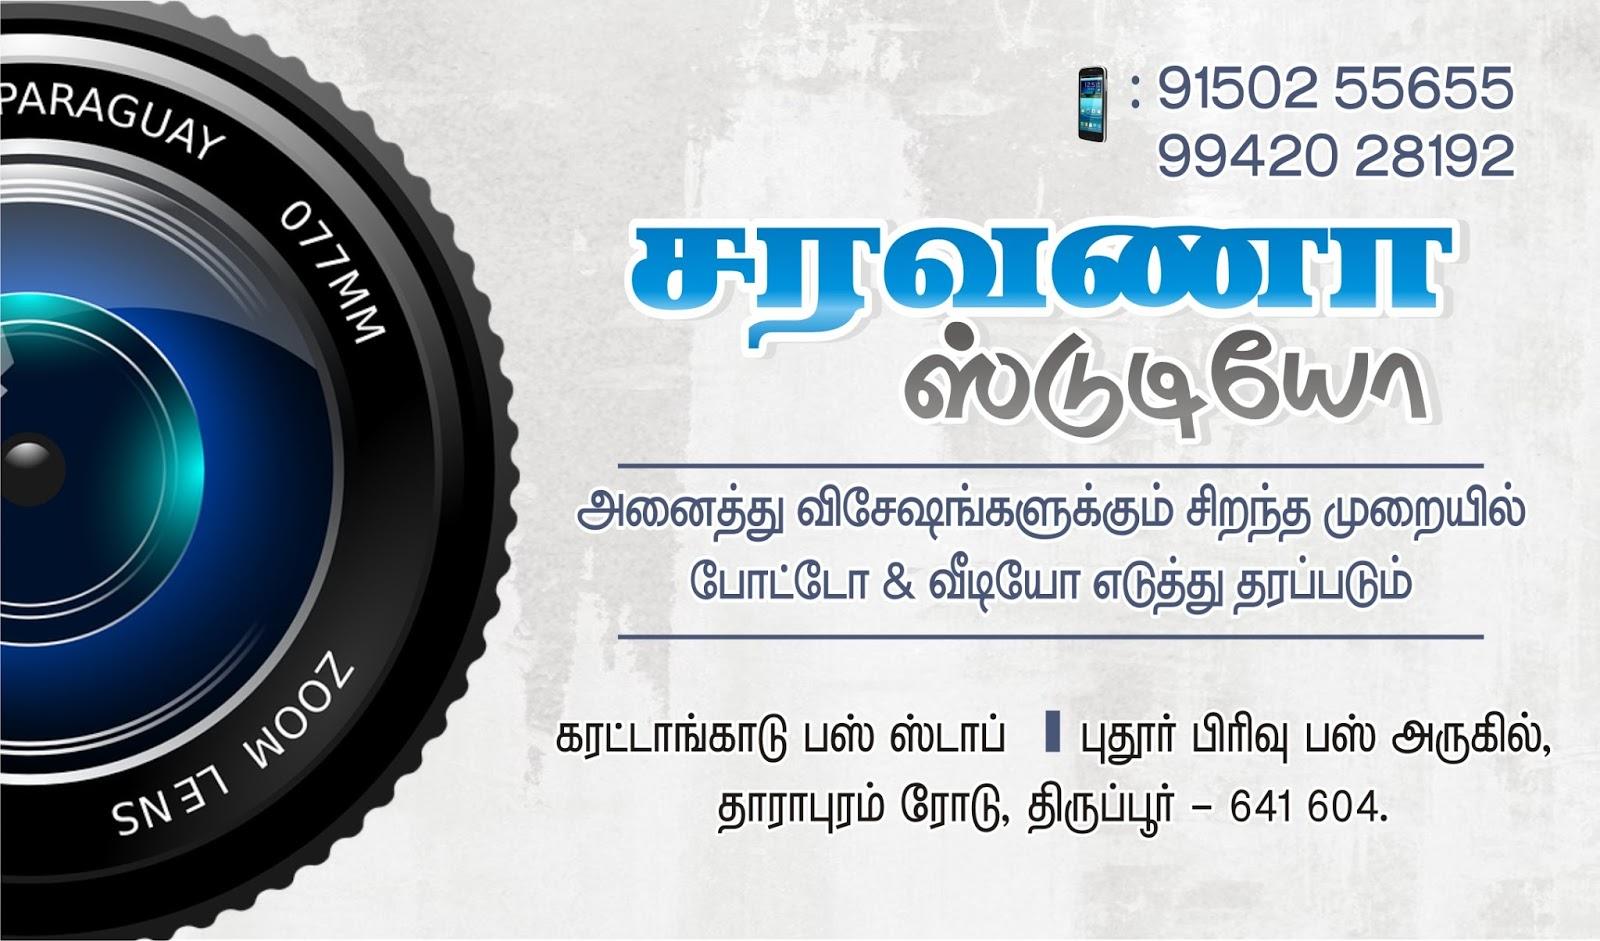 Saravana Photo Studio Visiting Card Design - Tirupur - Rain Digital ...